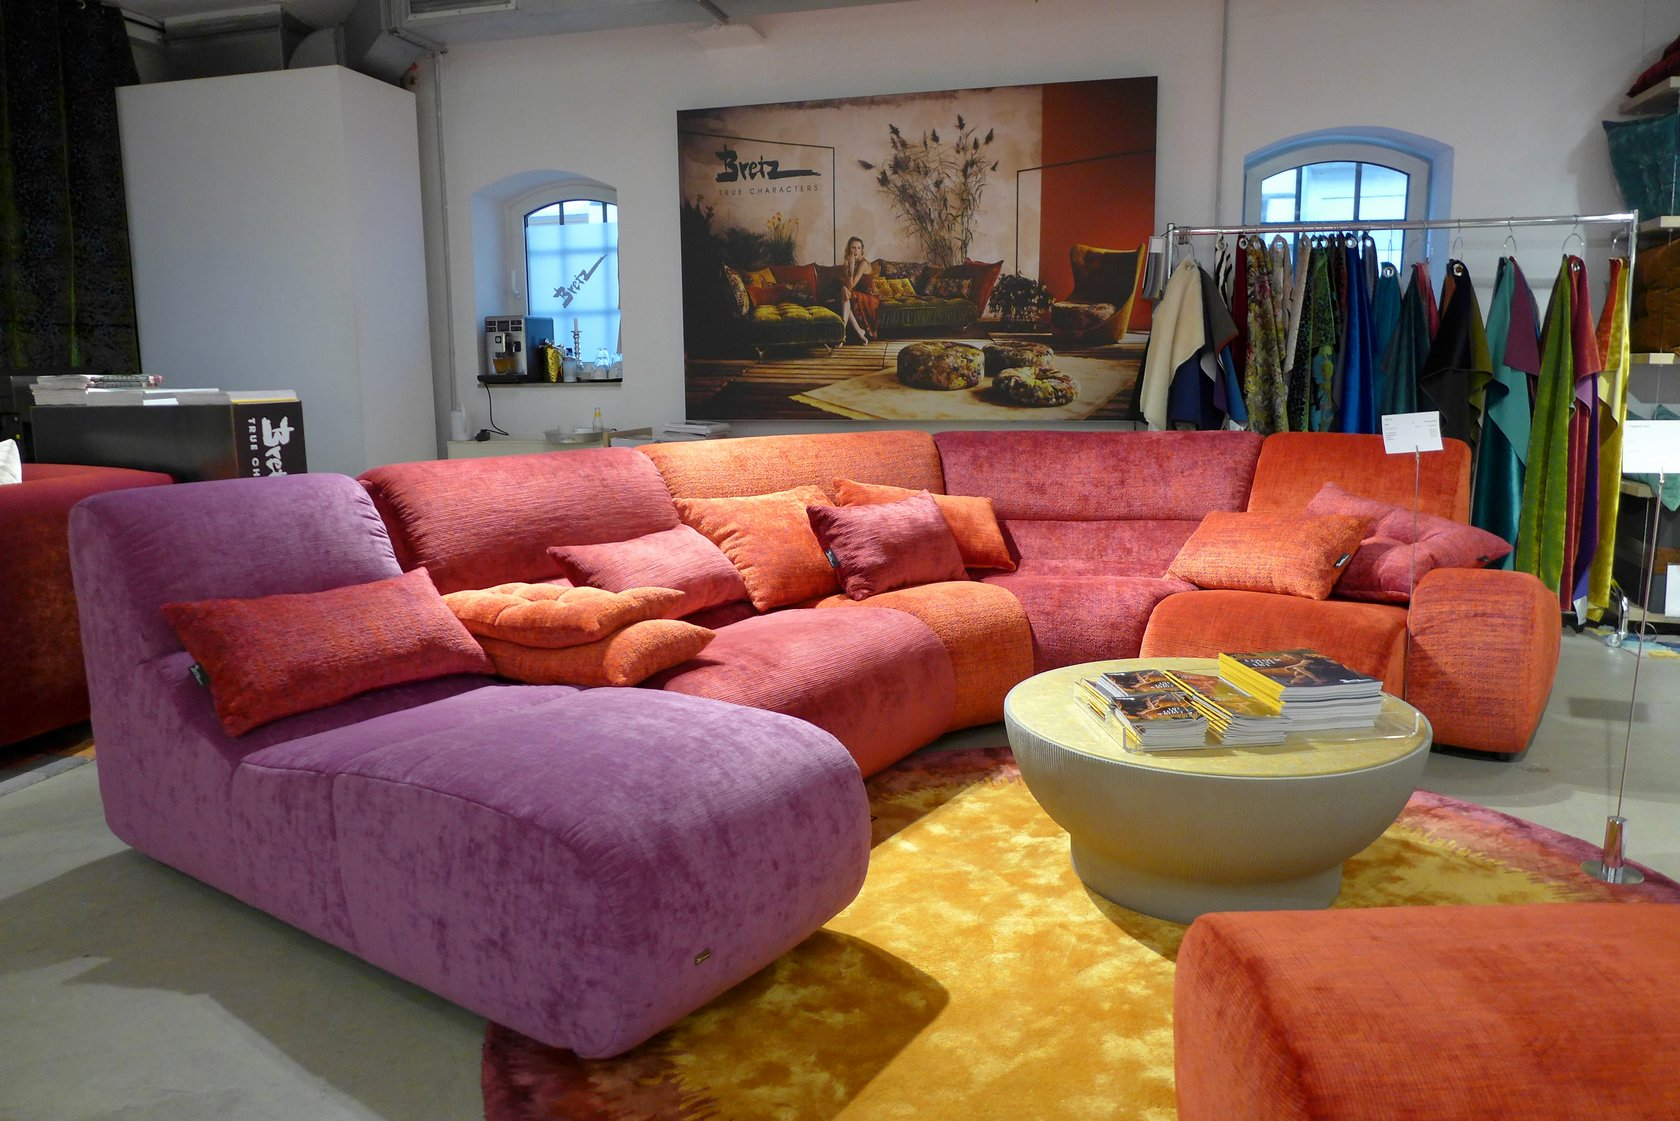 bretz flagship store hamburg stilwerk 2017 06 13 010 bretz store hamburg. Black Bedroom Furniture Sets. Home Design Ideas